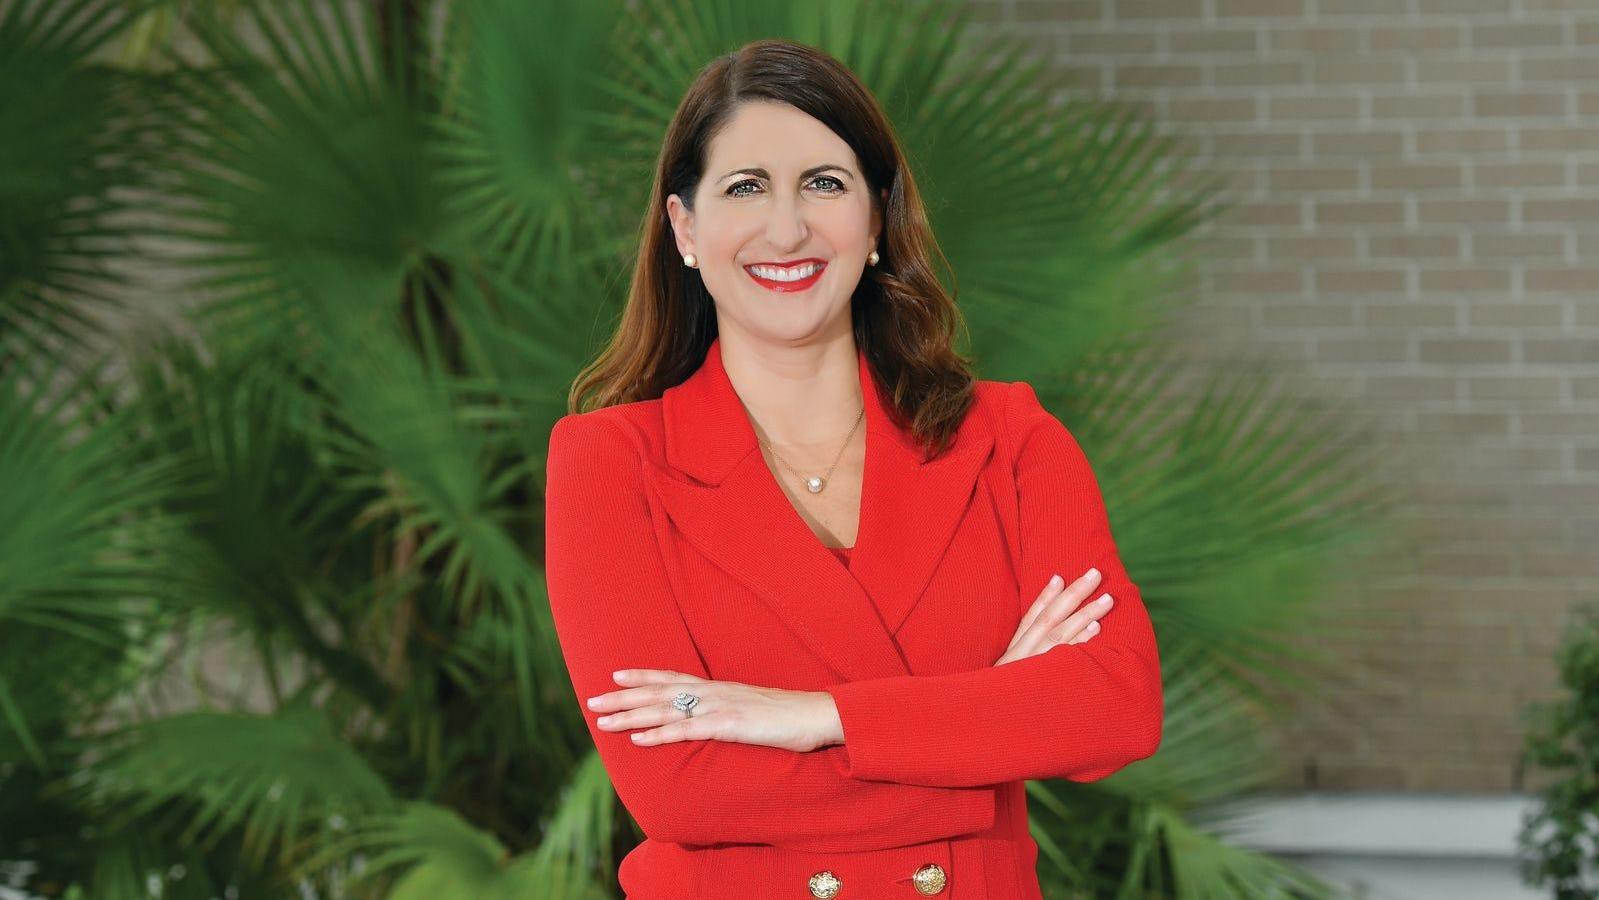 Polk State College President Angela Garcia Falconetti